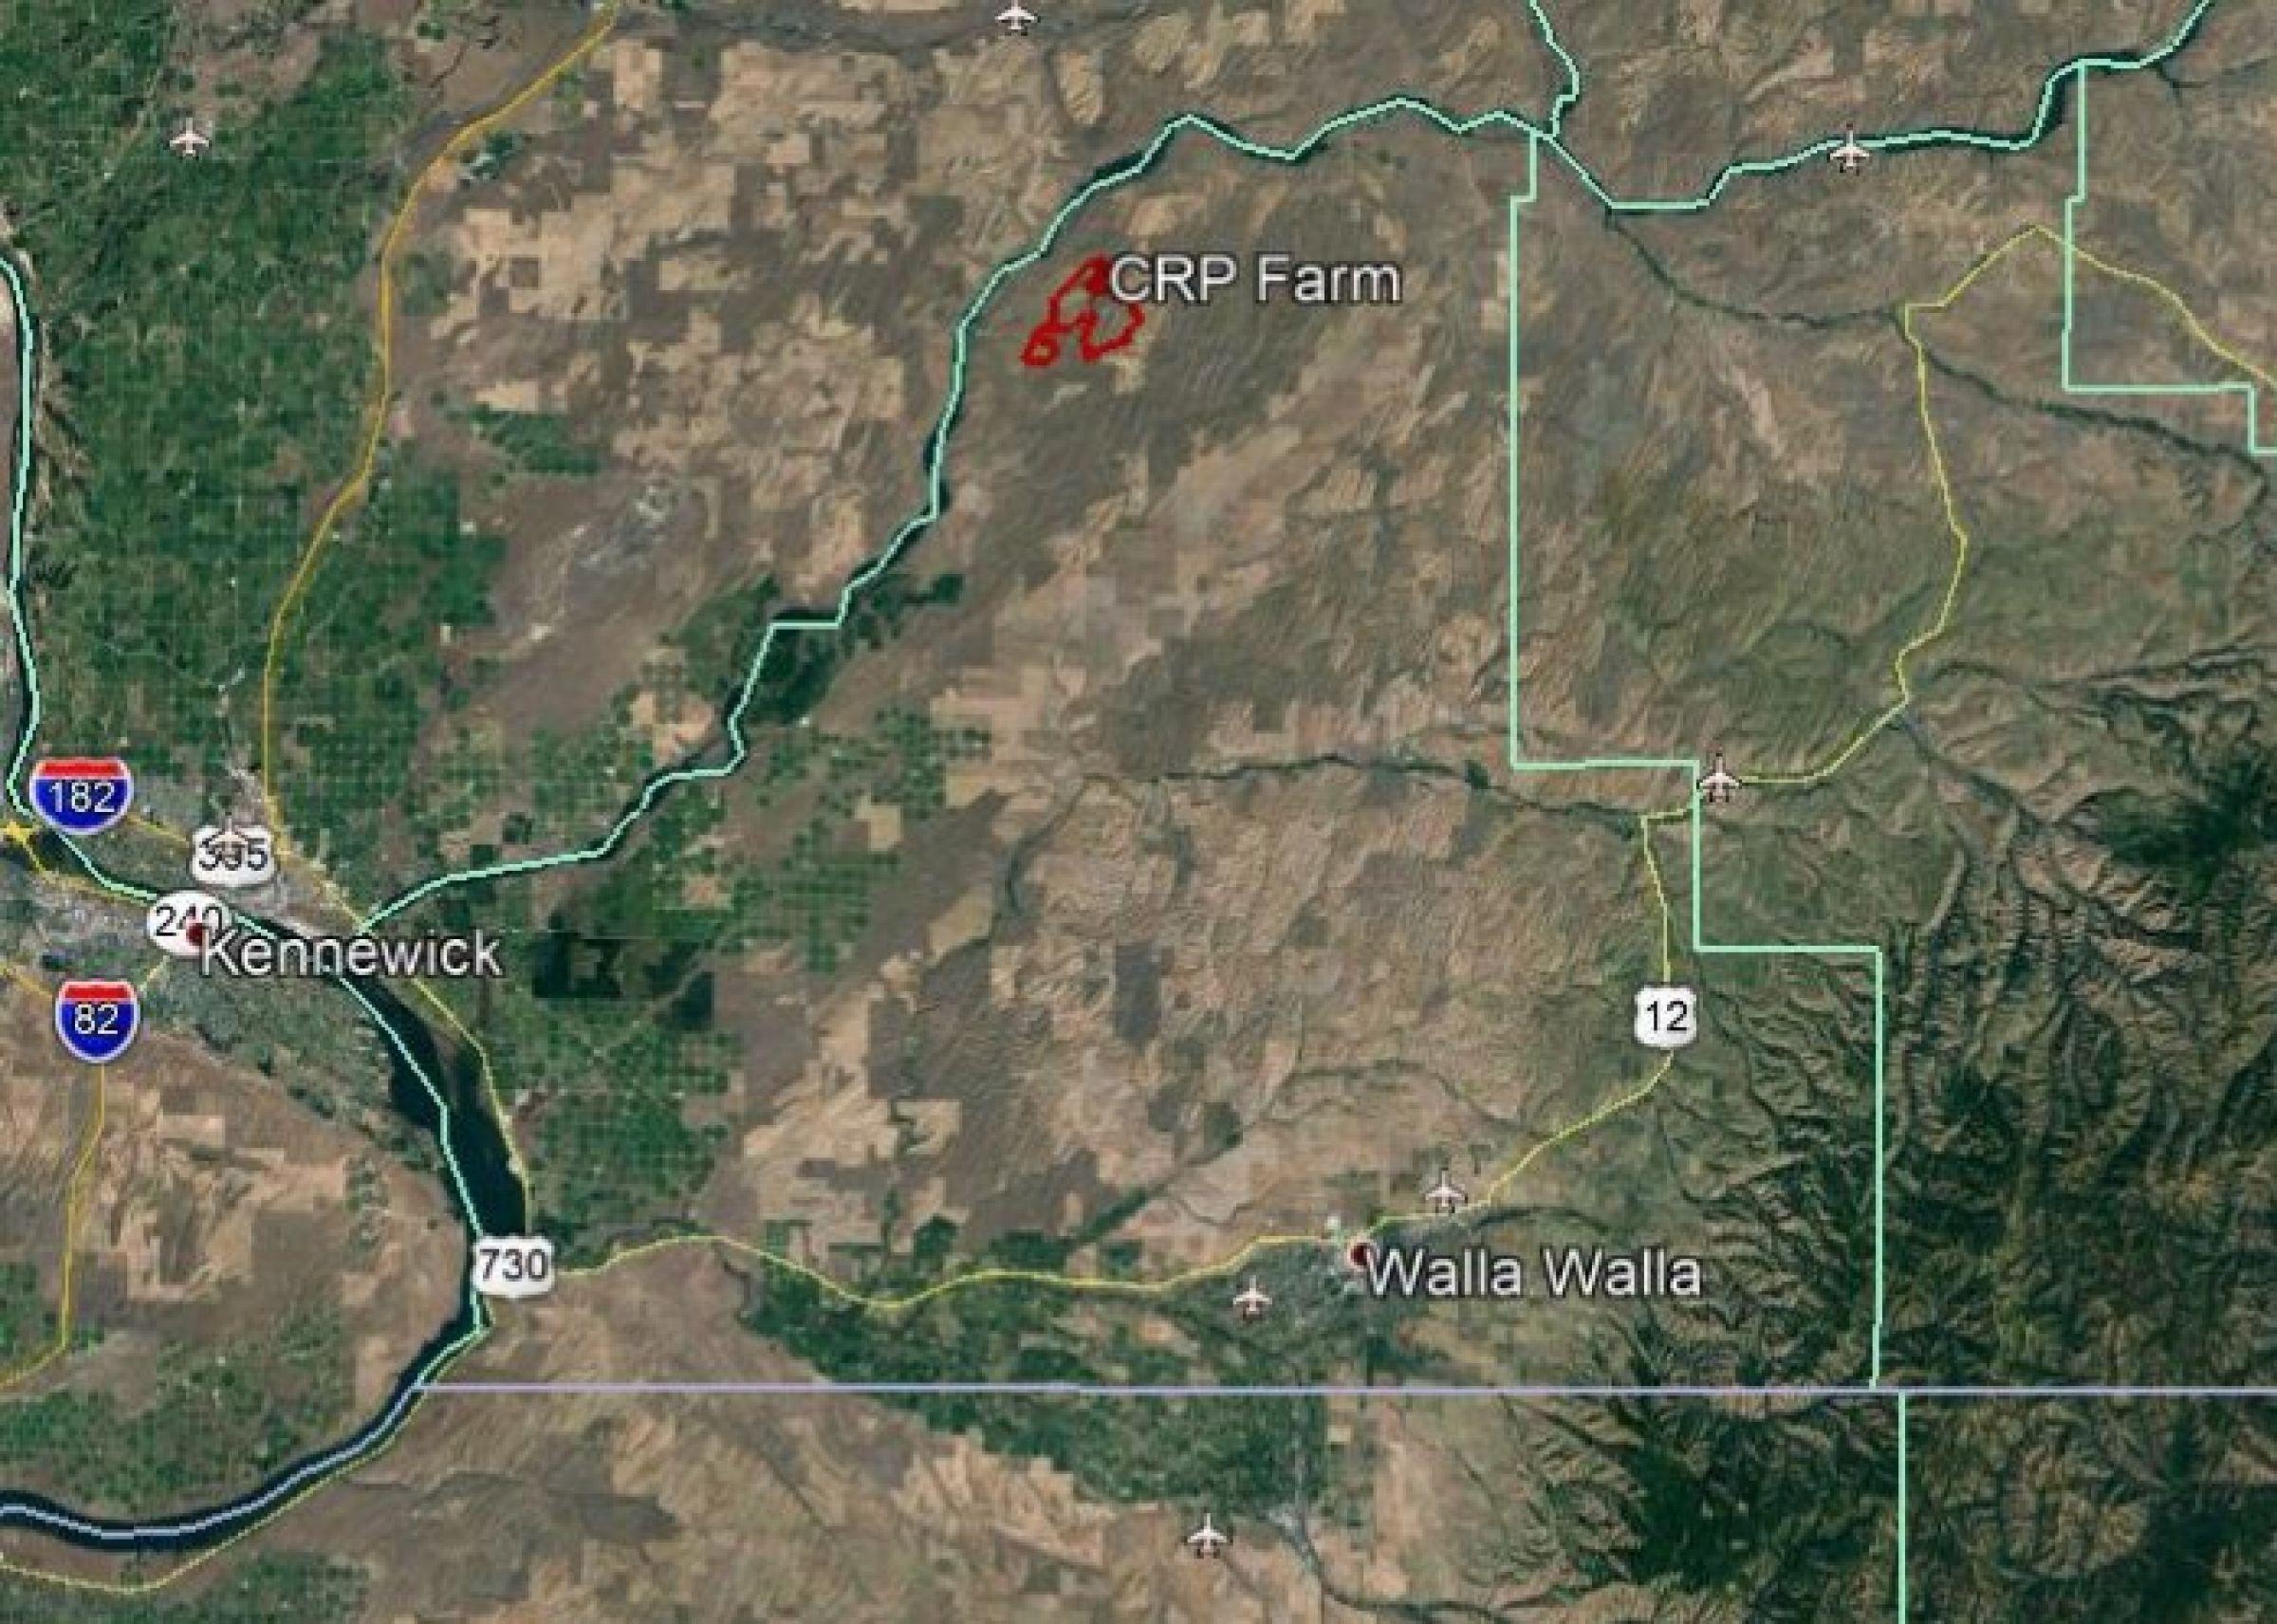 land-walla-walla-county-washington-3293-acres-listing-number-15224-0-2020-10-22-130914.jpg